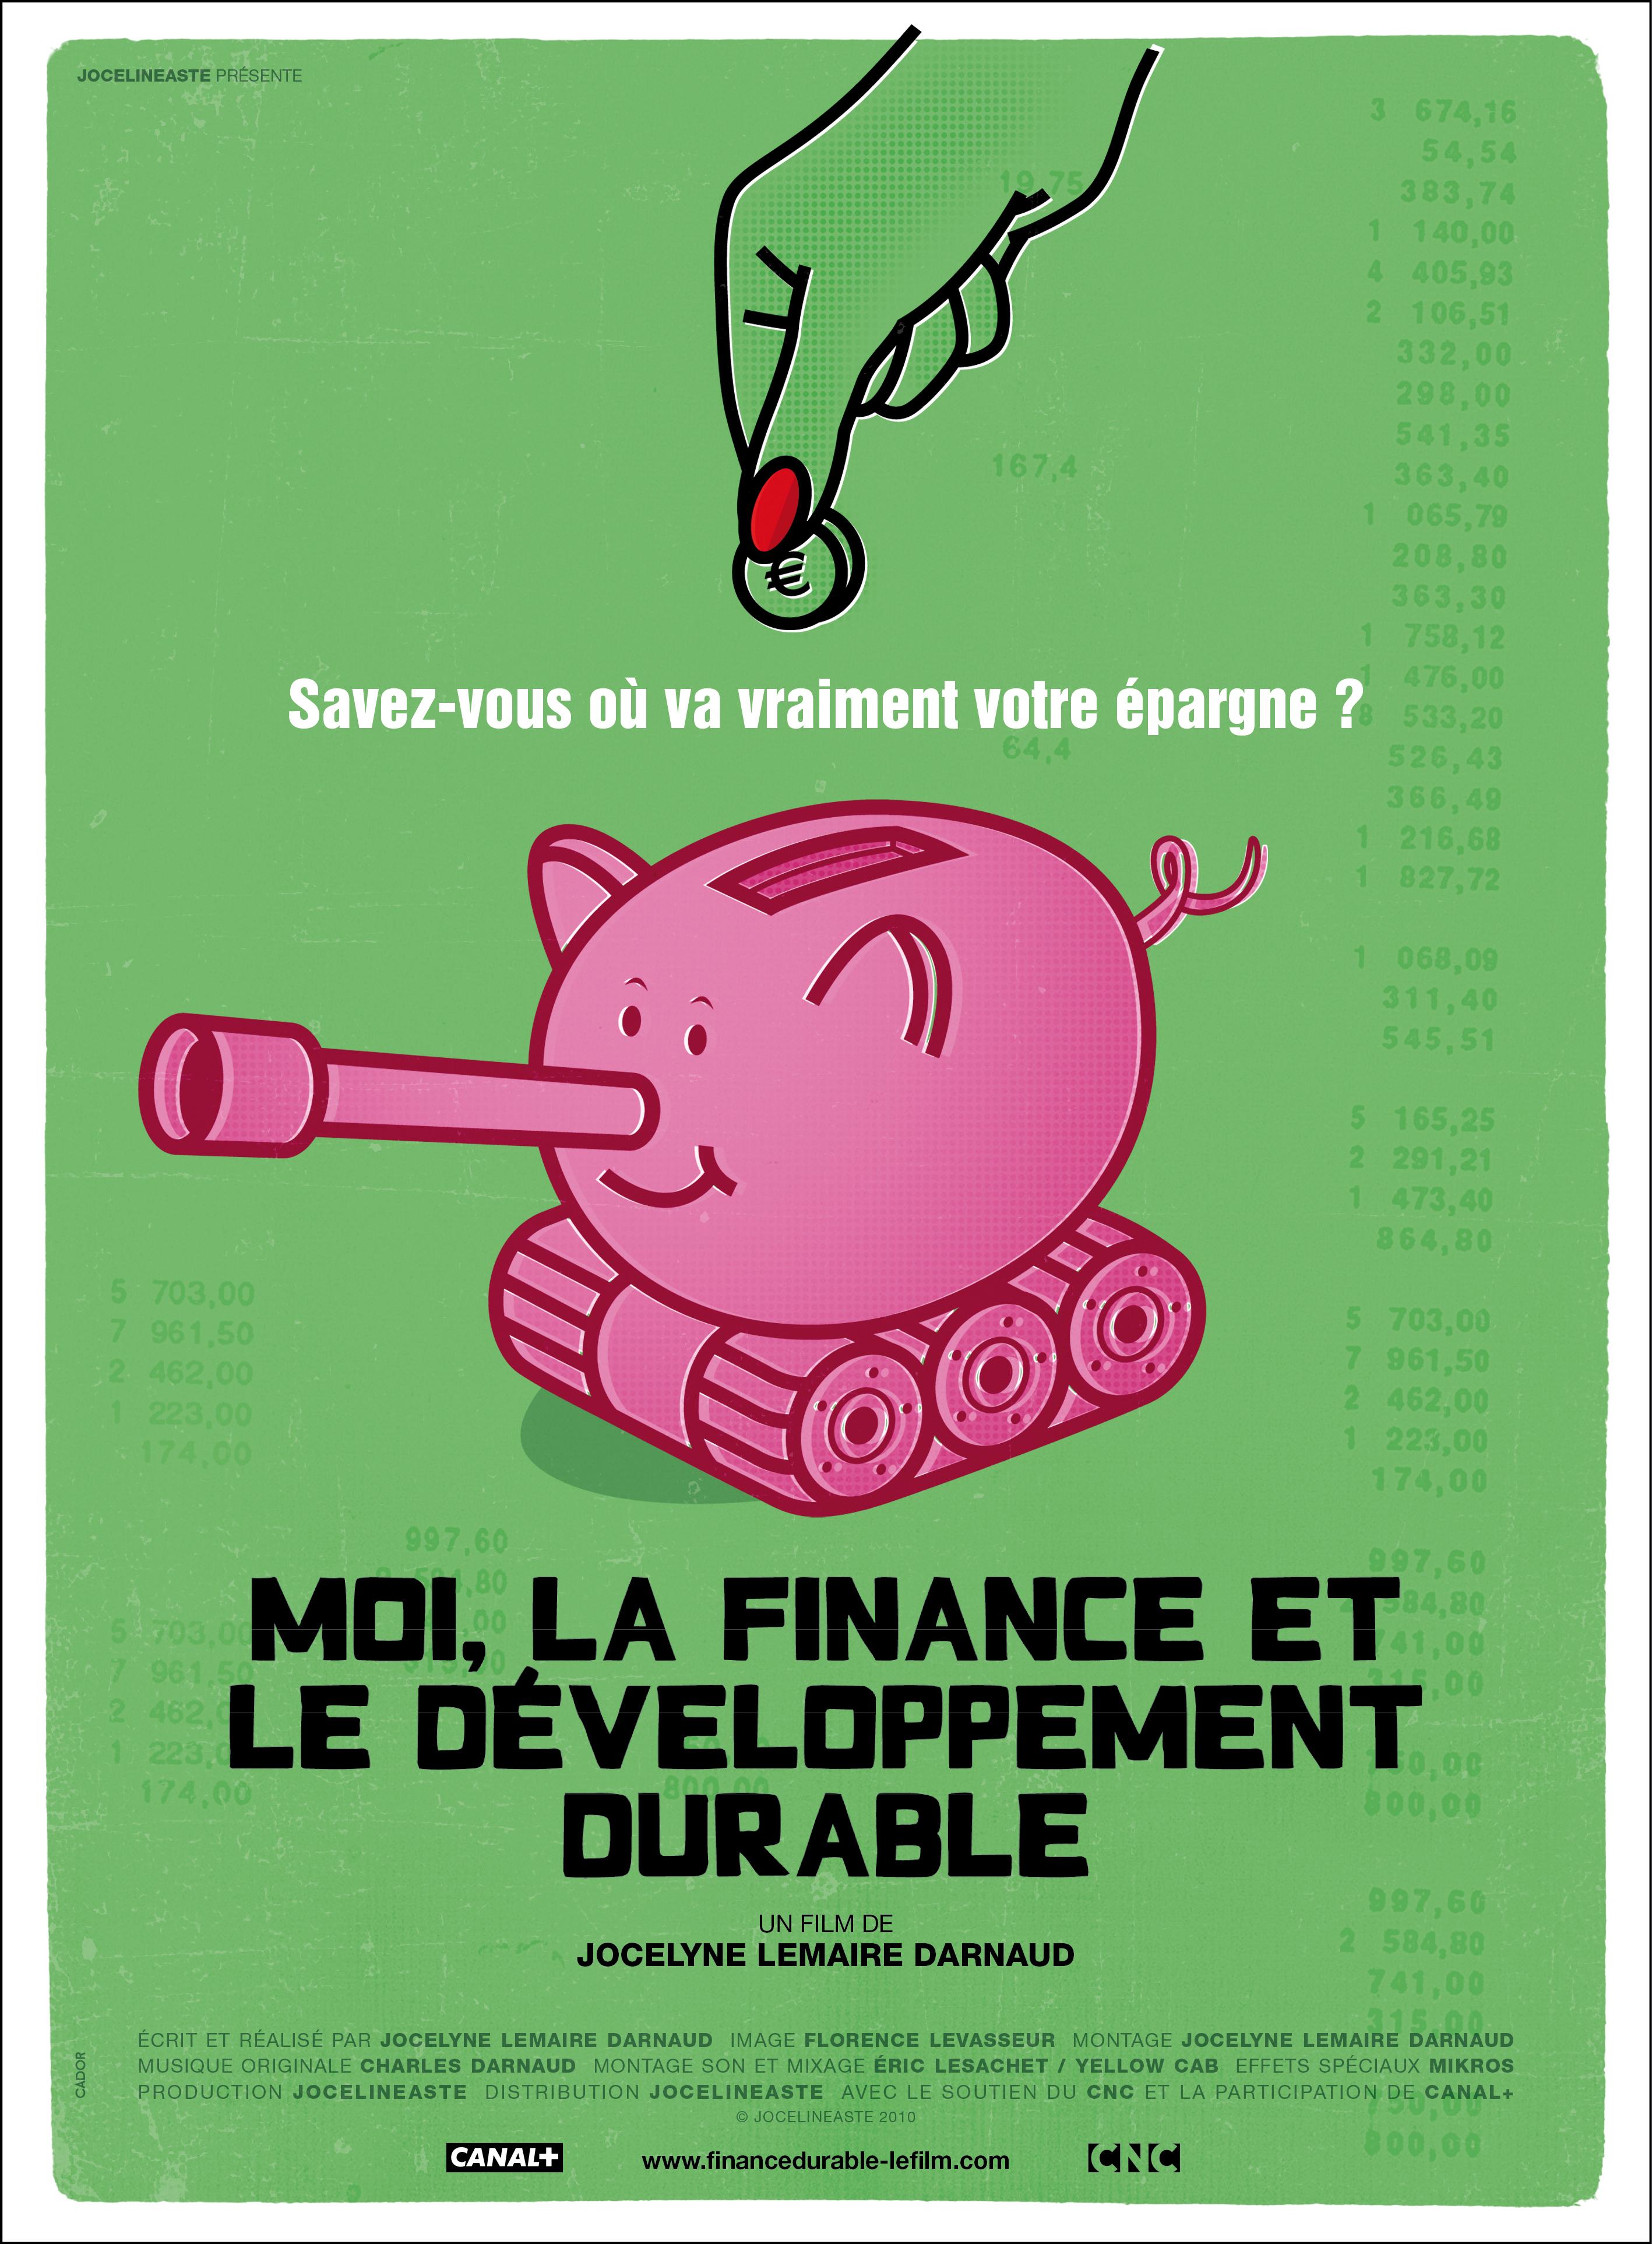 MOI, LA FINANCE_AFFICHE